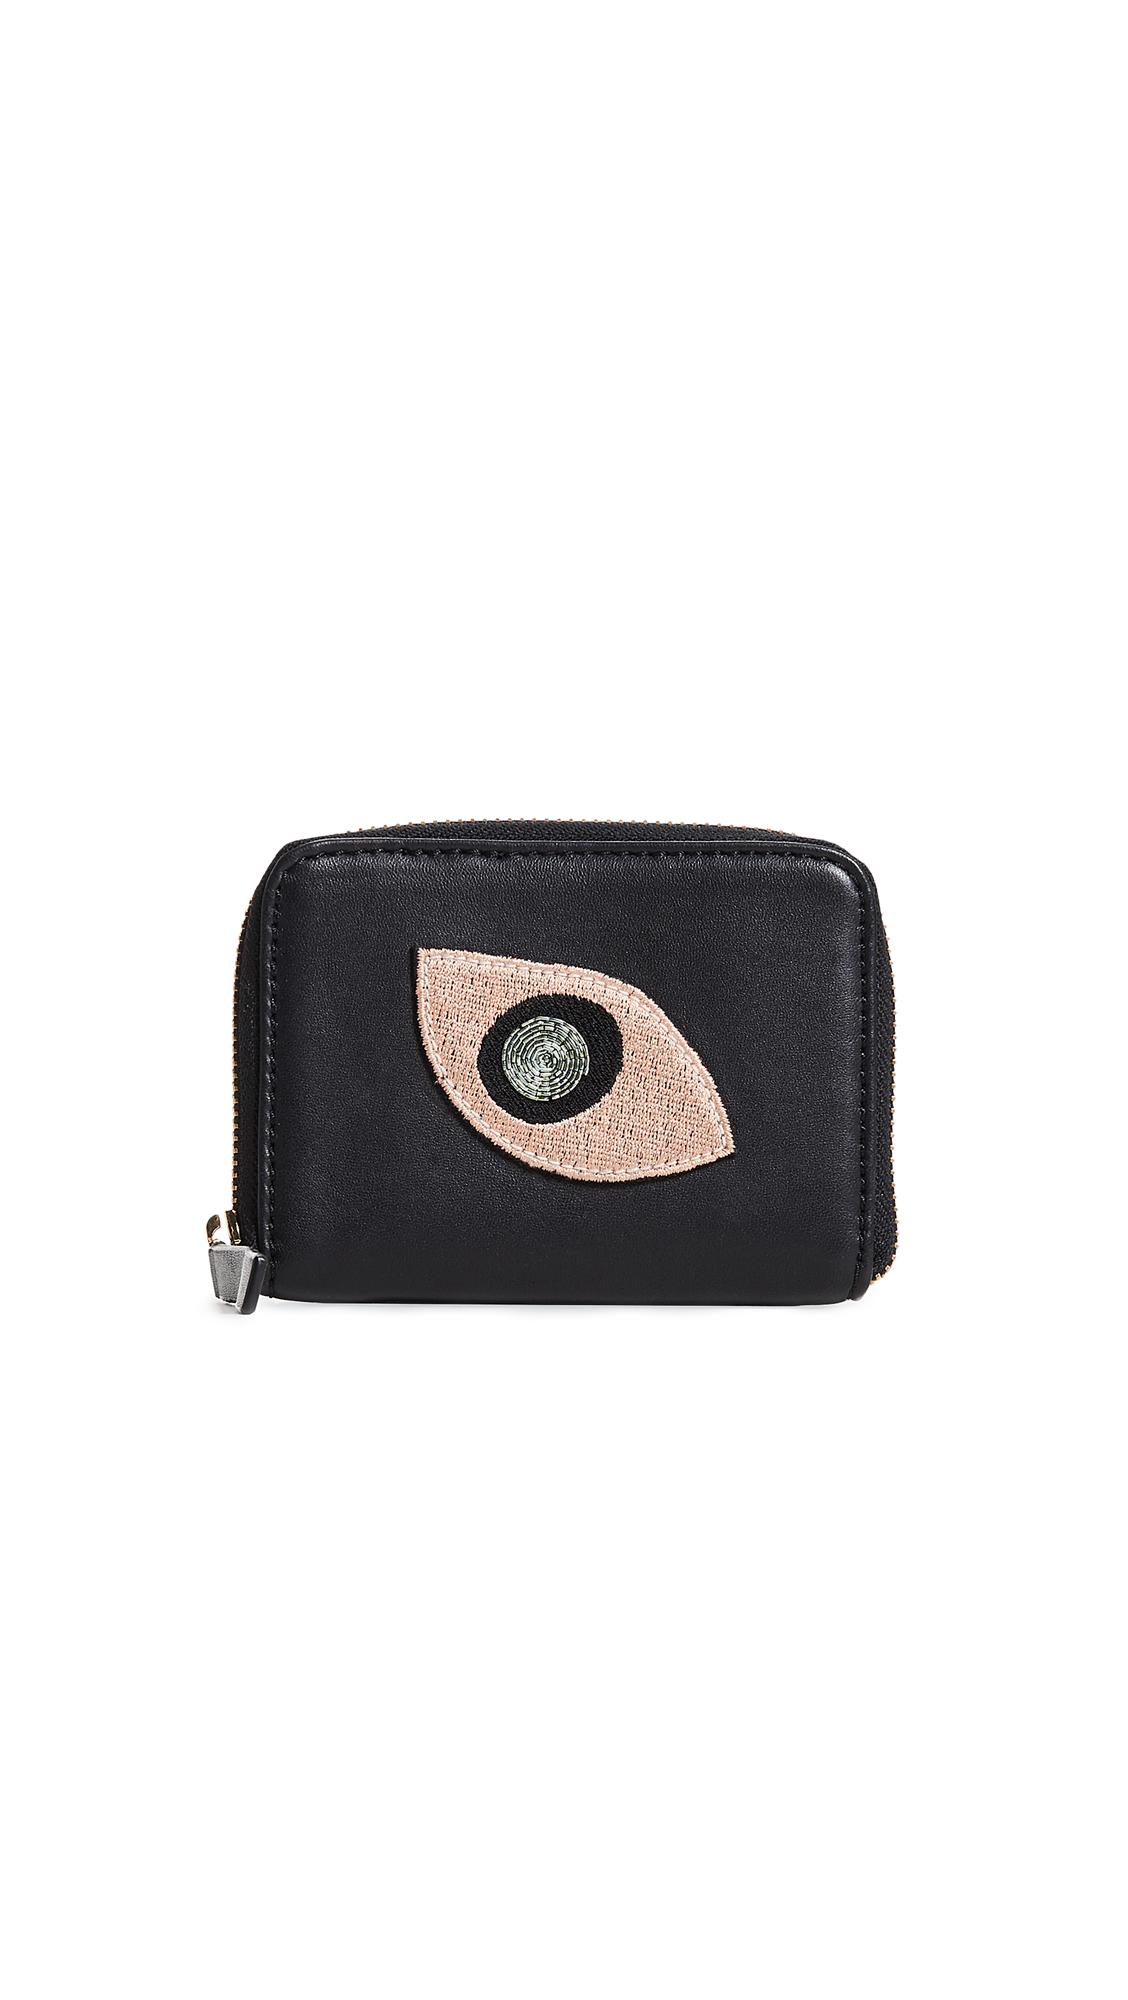 Lizzie Fortunato Abstract Eye Zip Coin Purse